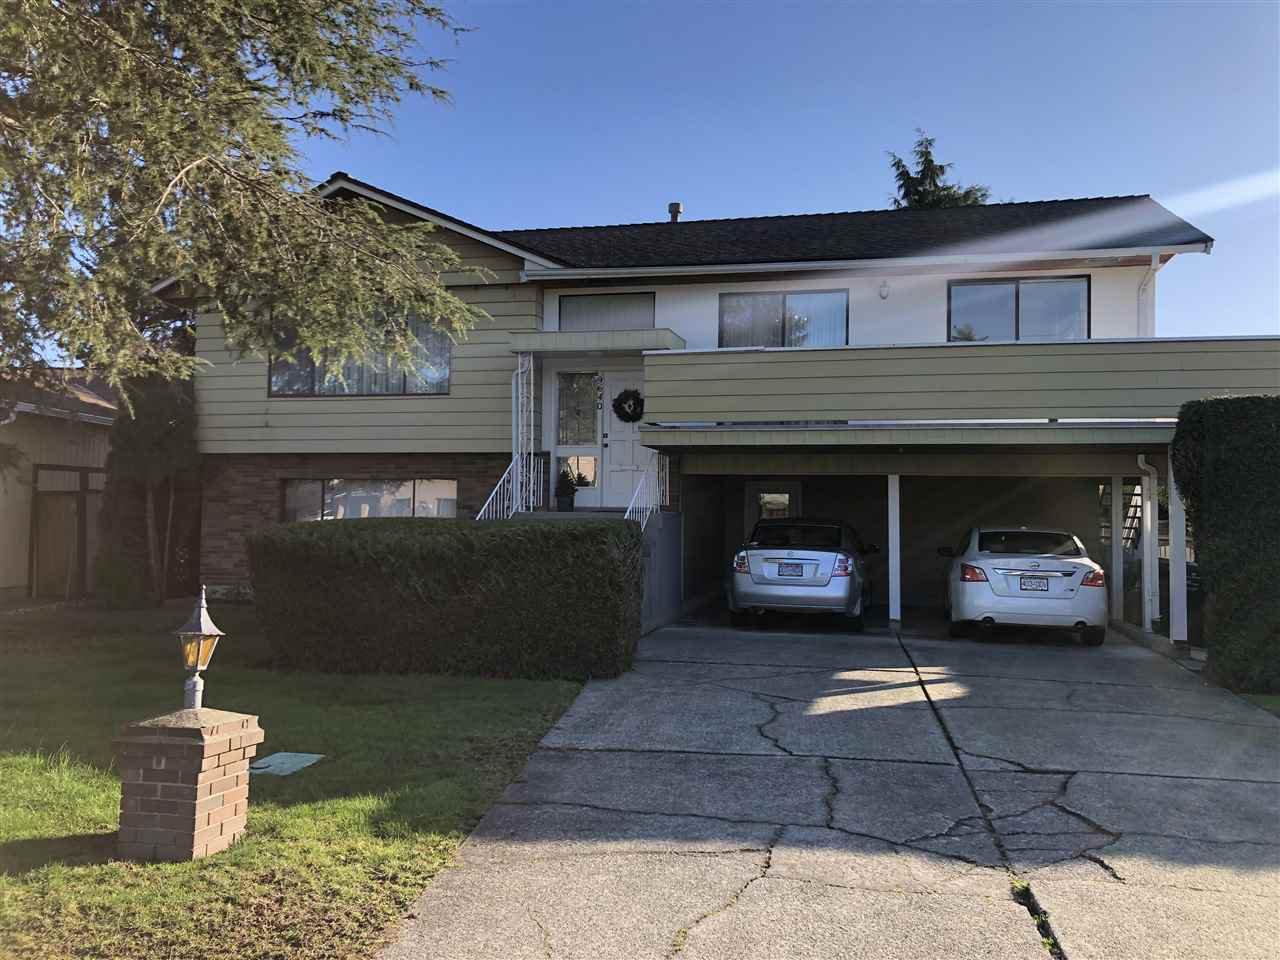 Main Photo: 9640 SNOWDON Avenue in Richmond: South Arm House for sale : MLS®# R2438920